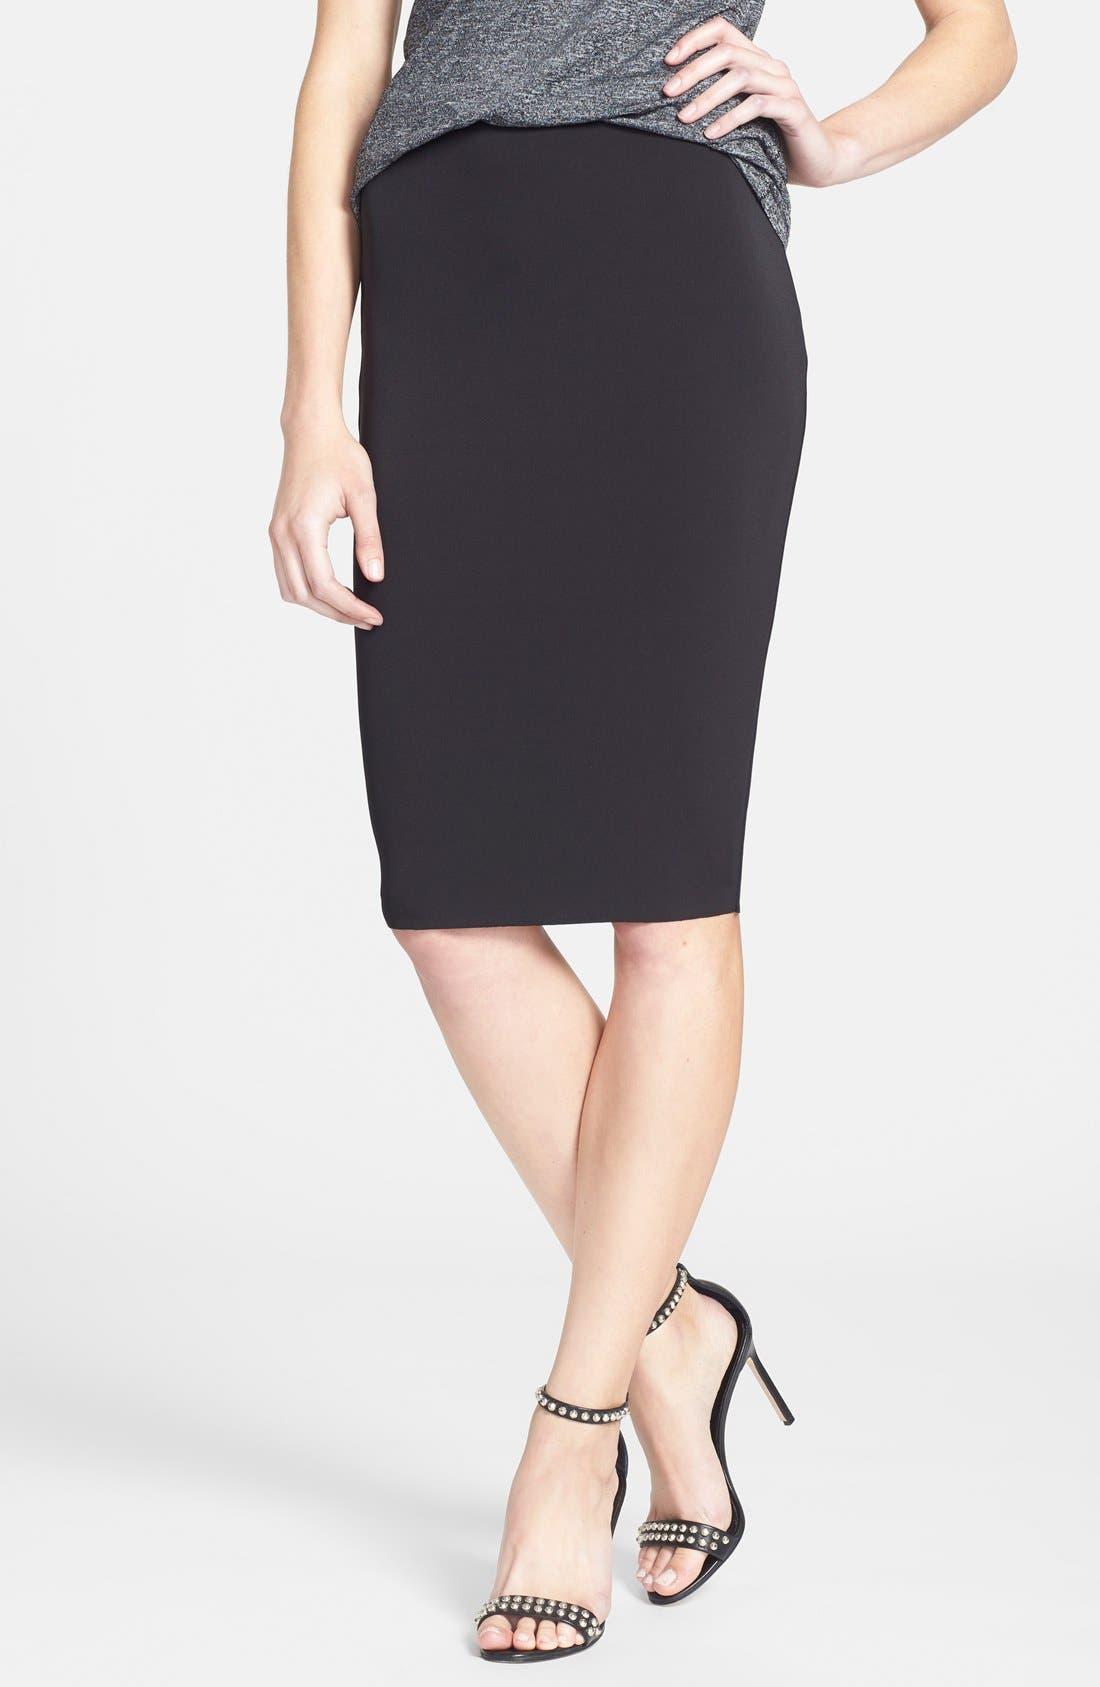 Alternate Image 1 Selected - Bailey 44 'Fandango' Skirt